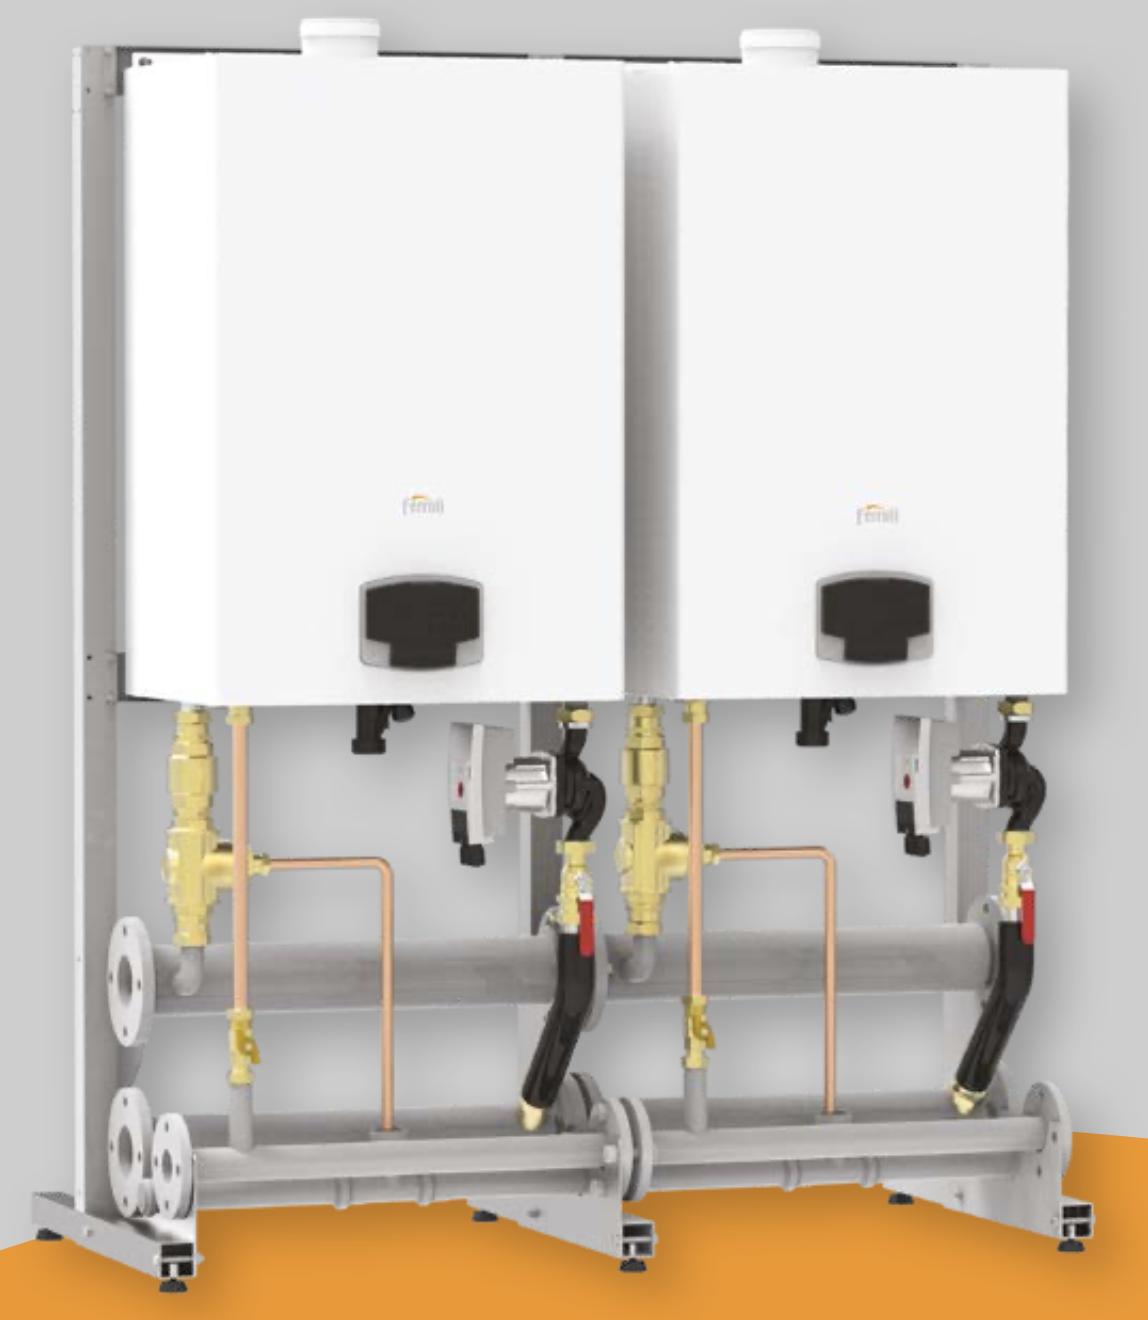 Zidni kotlovi na gas kapaciteta do 150 kW - FORCE W